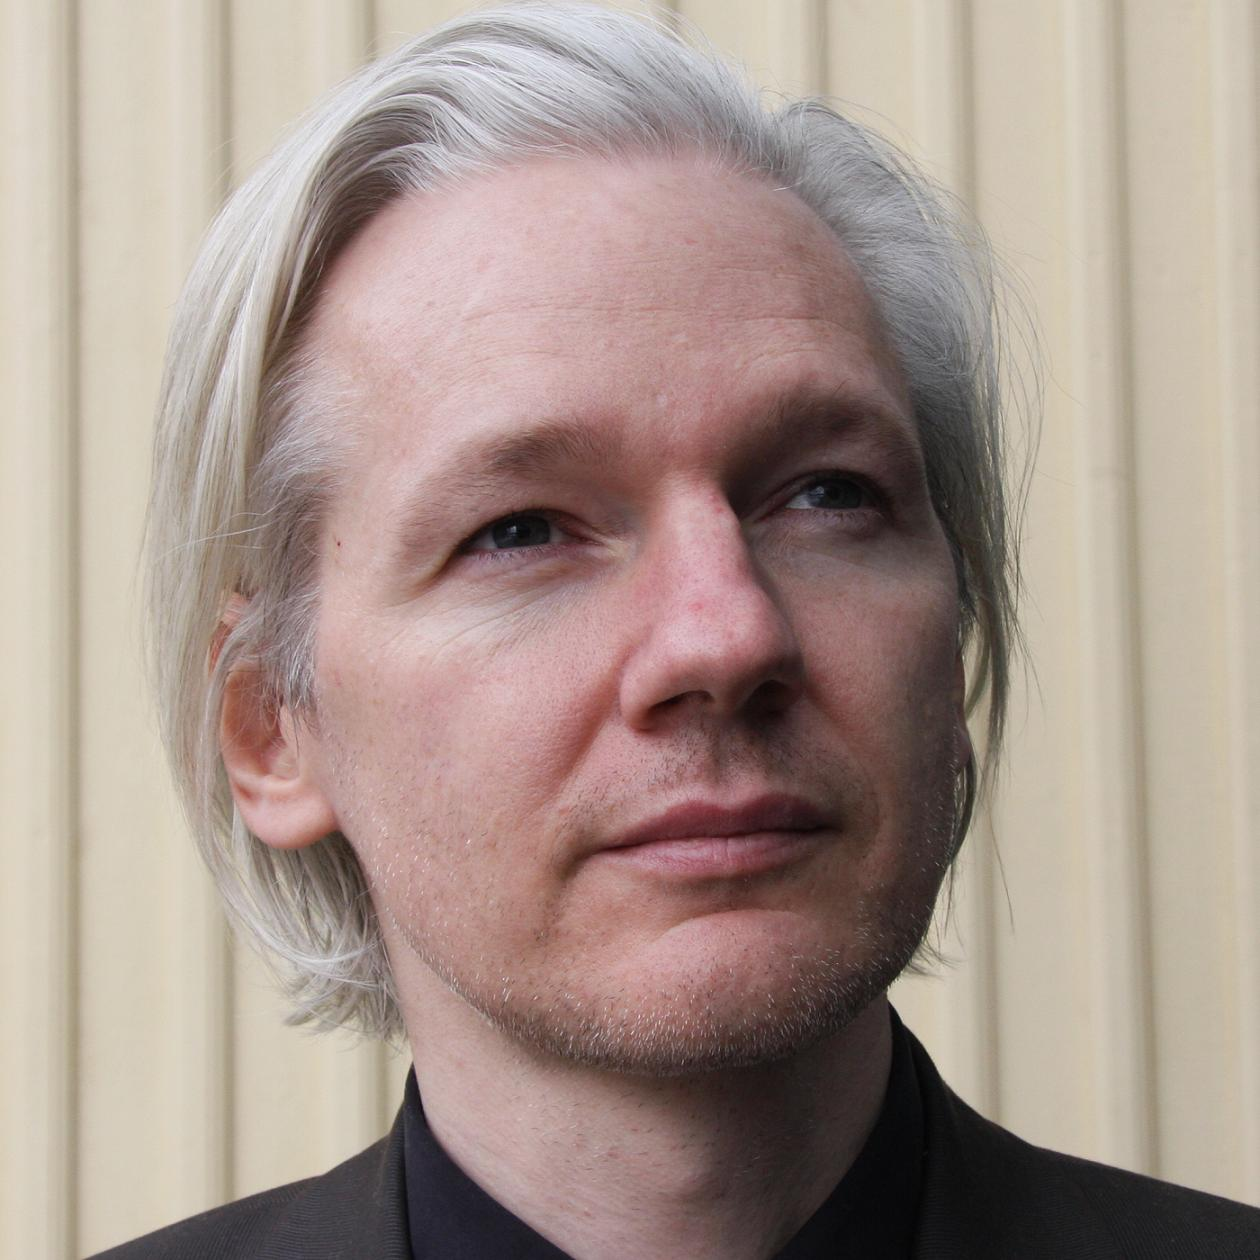 Julian Assange Bio, Net Worth, Facts